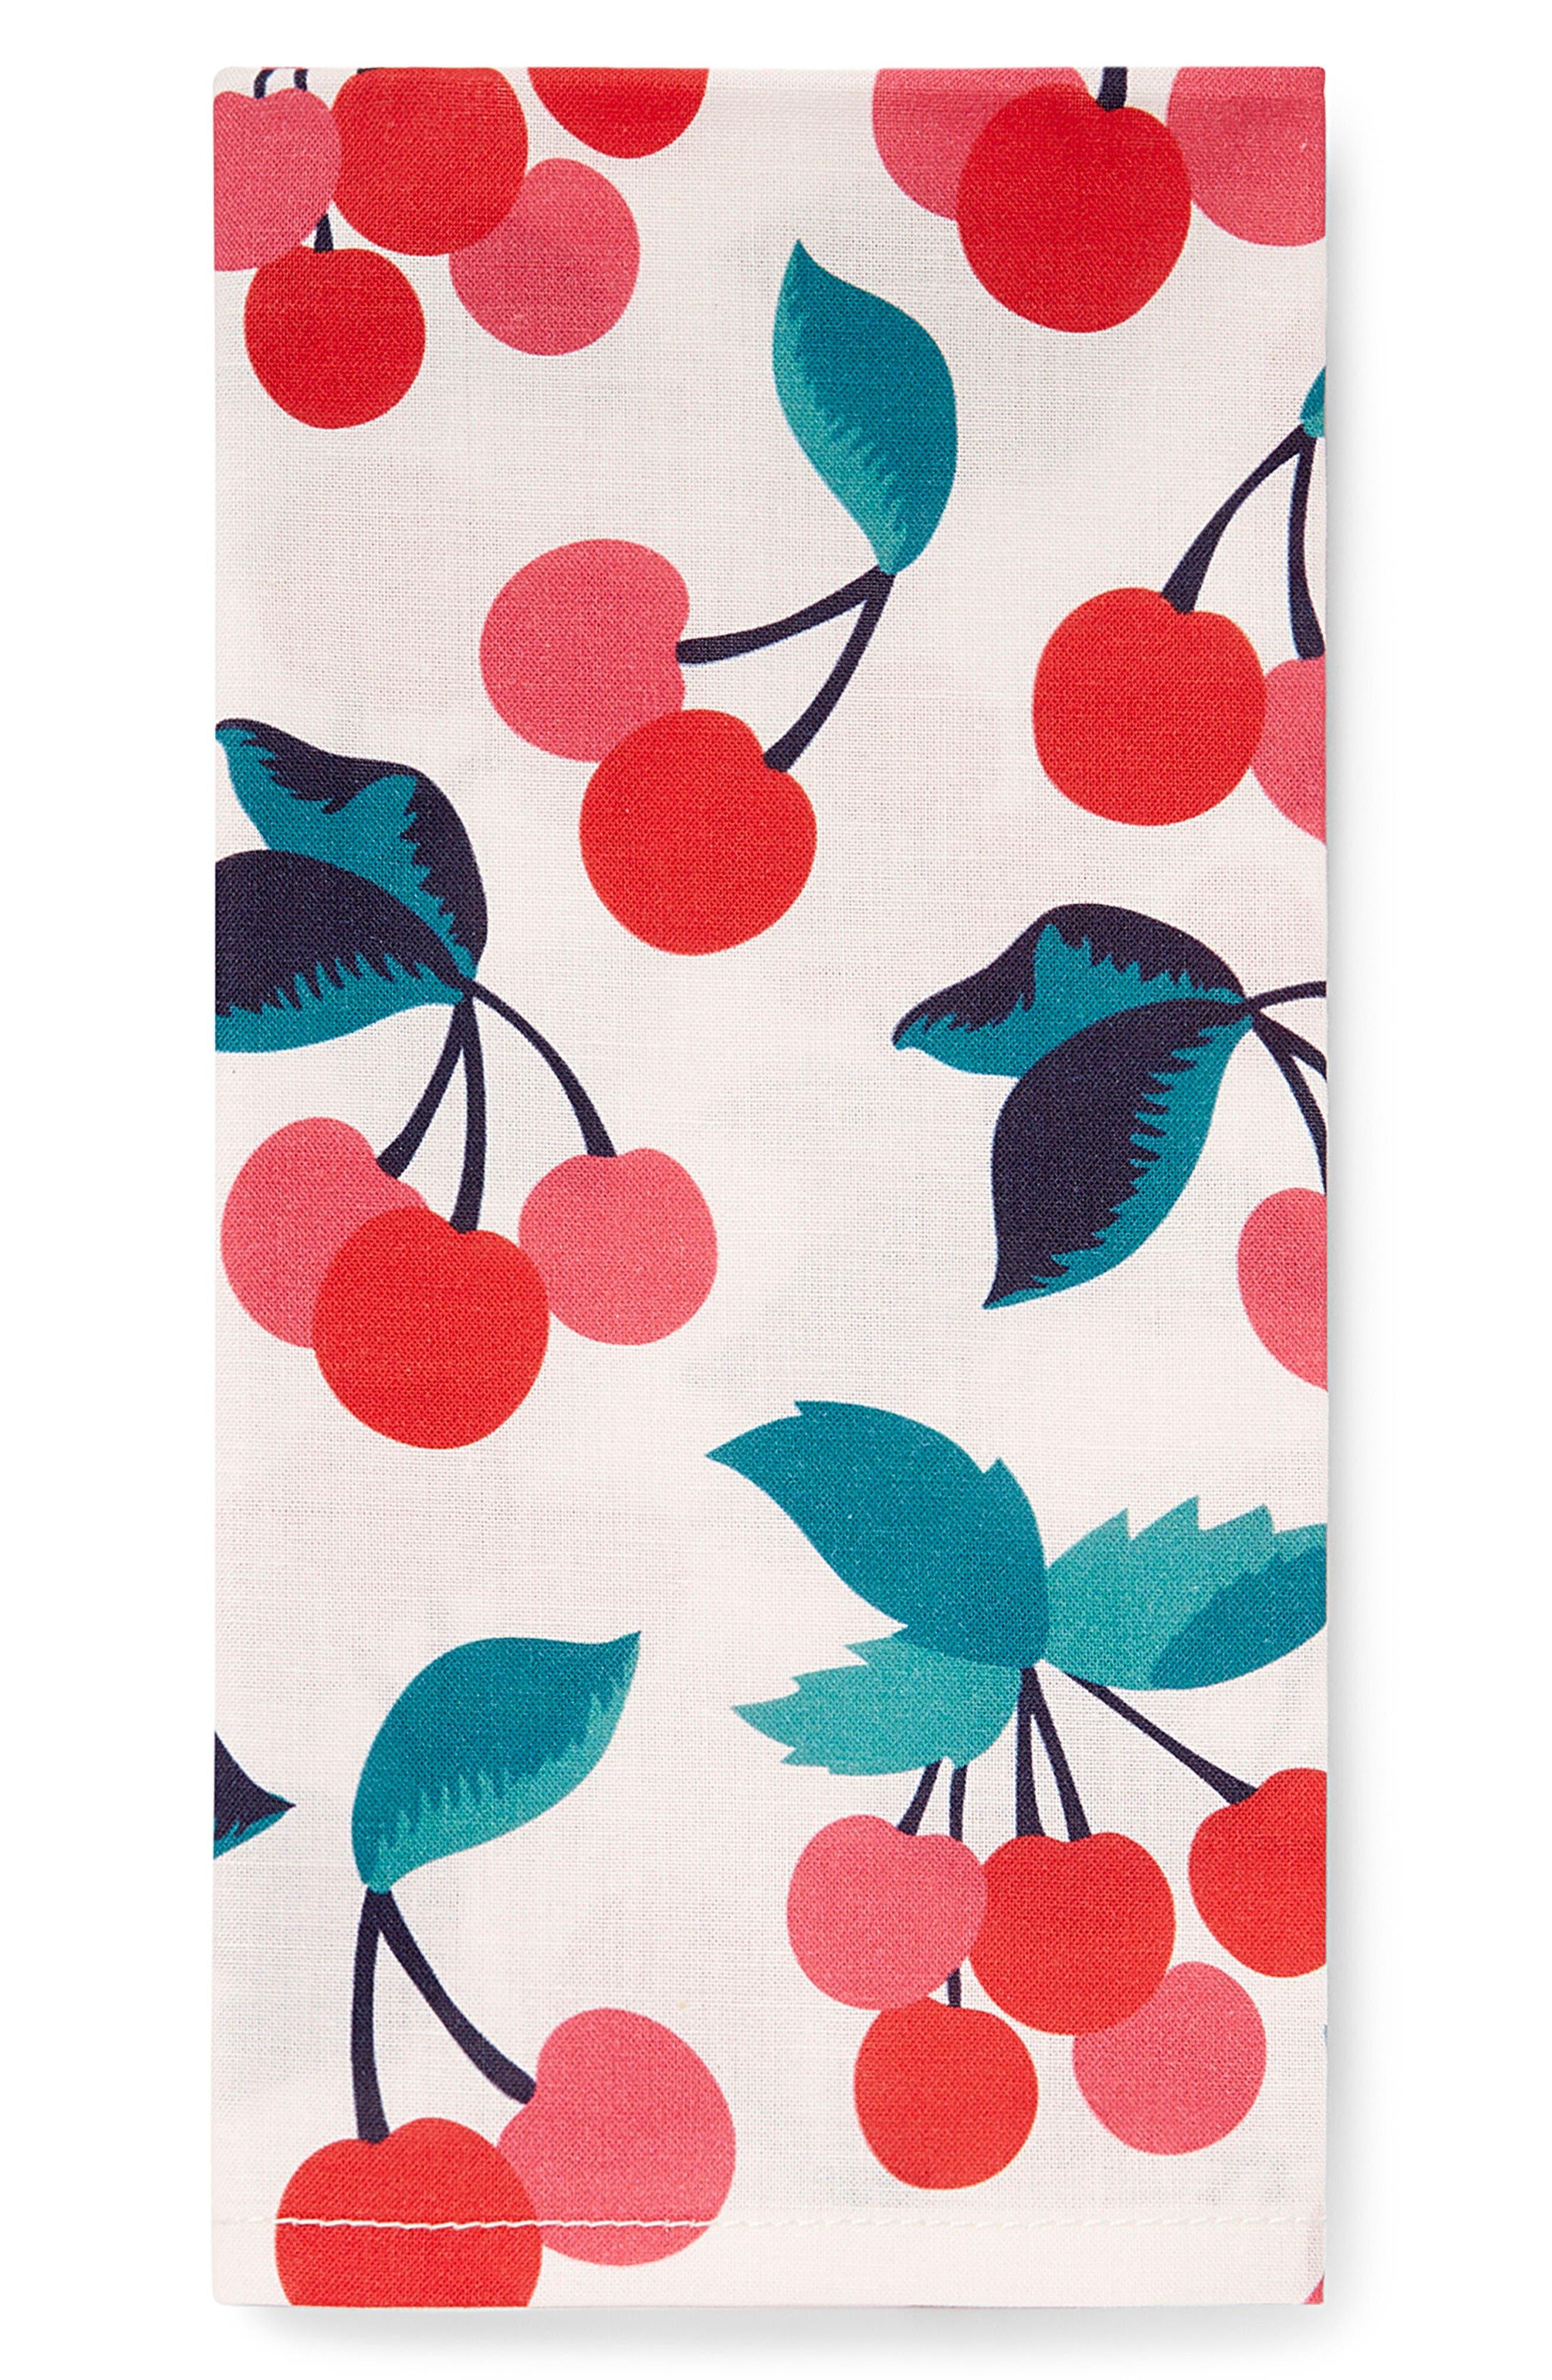 Set of 4 Cherry Print Cloth Napkins,                         Main,                         color, Cherry